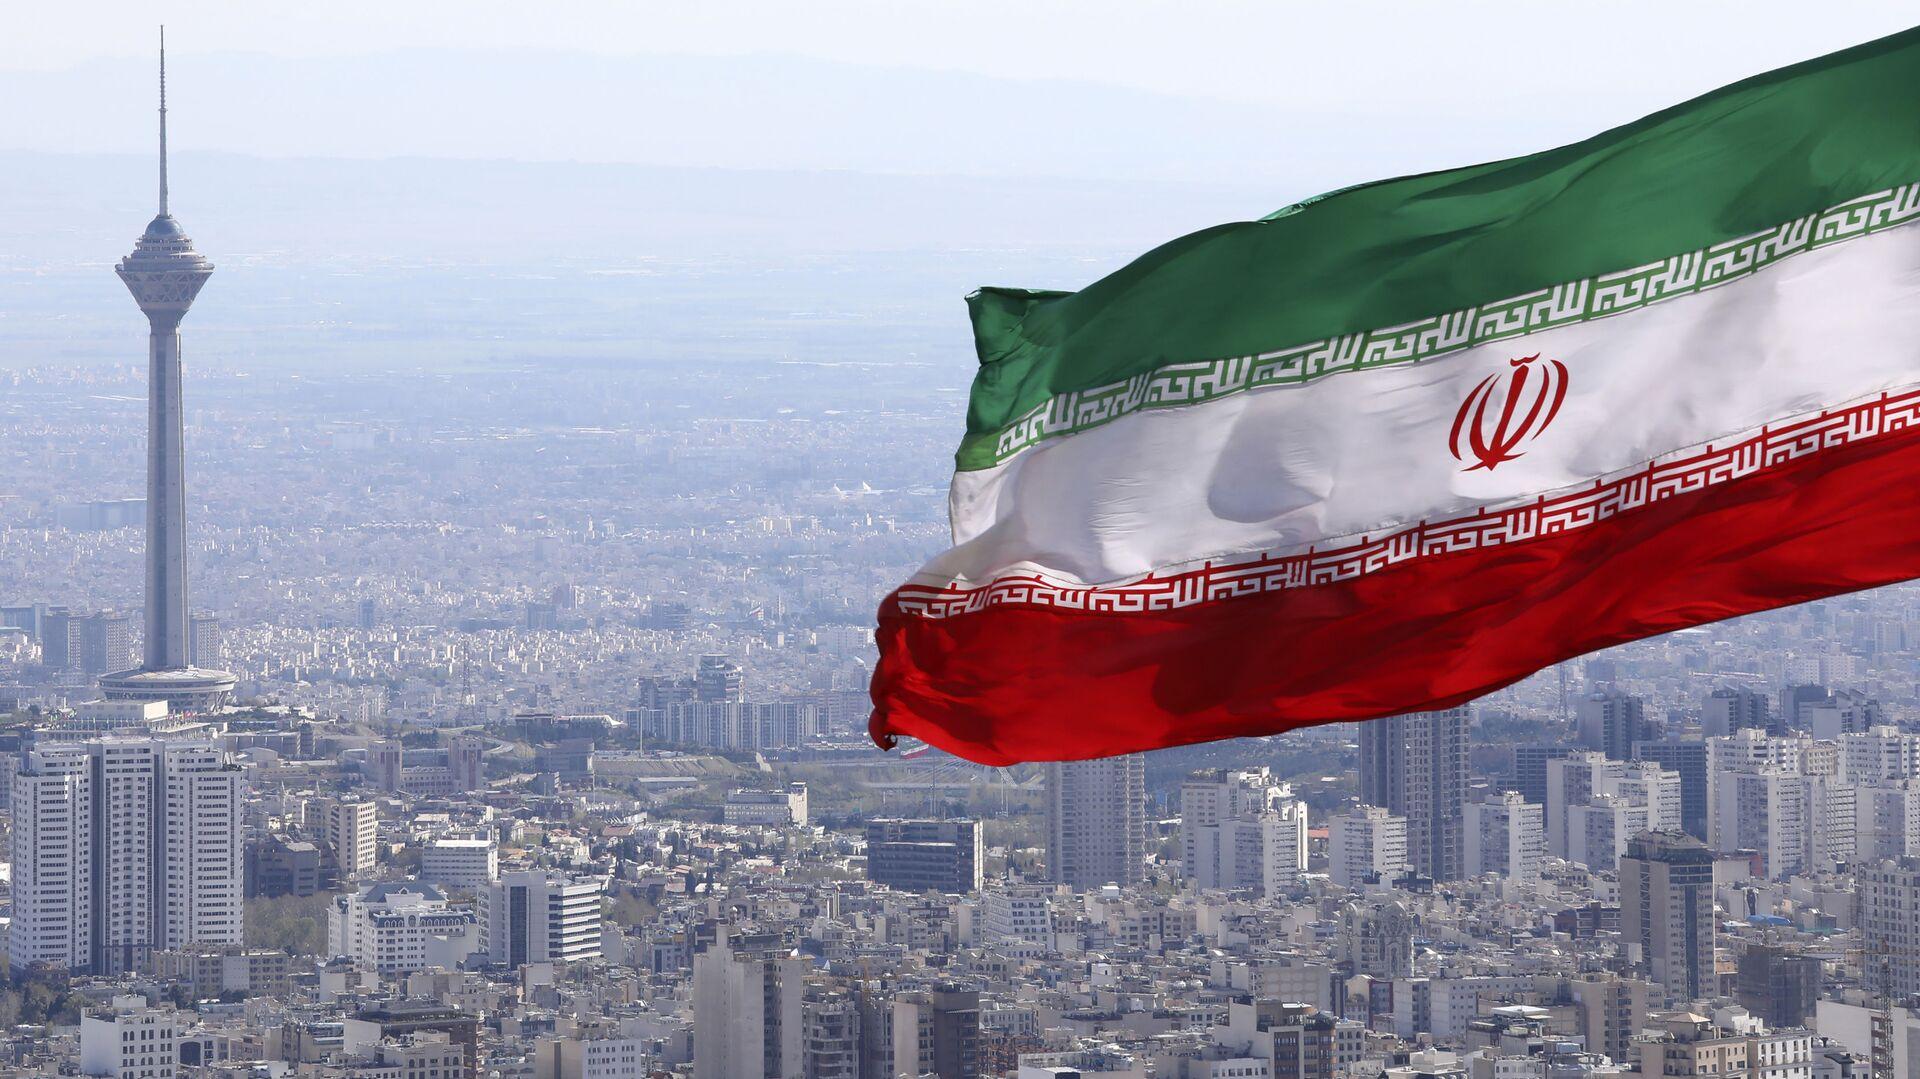 Bandiera iraniana, Iran, Teheran - Sputnik Italia, 1920, 04.07.2021